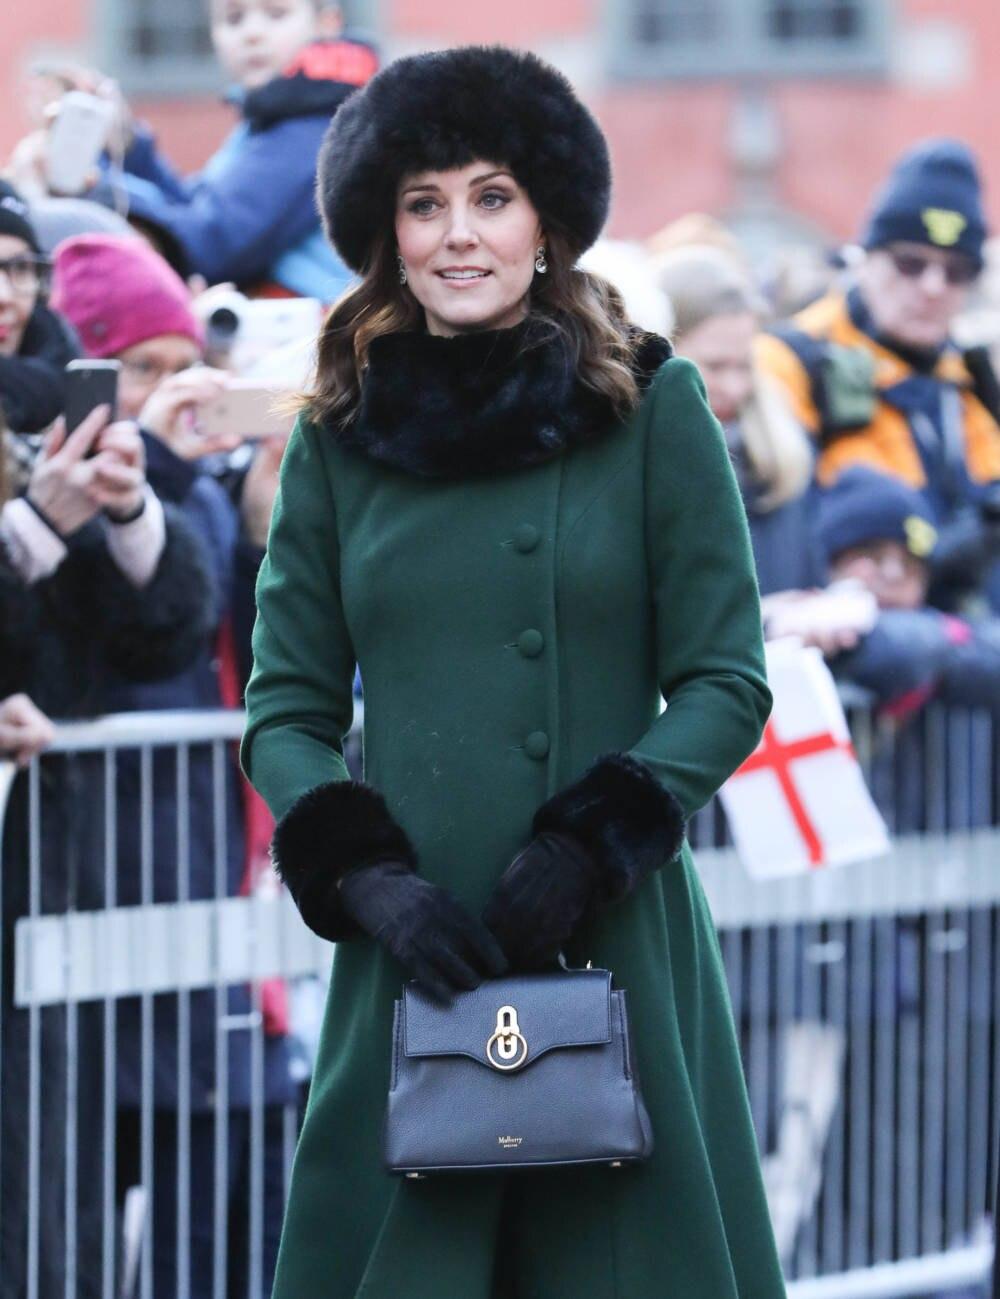 Herzogin Kate im grünen Mantel